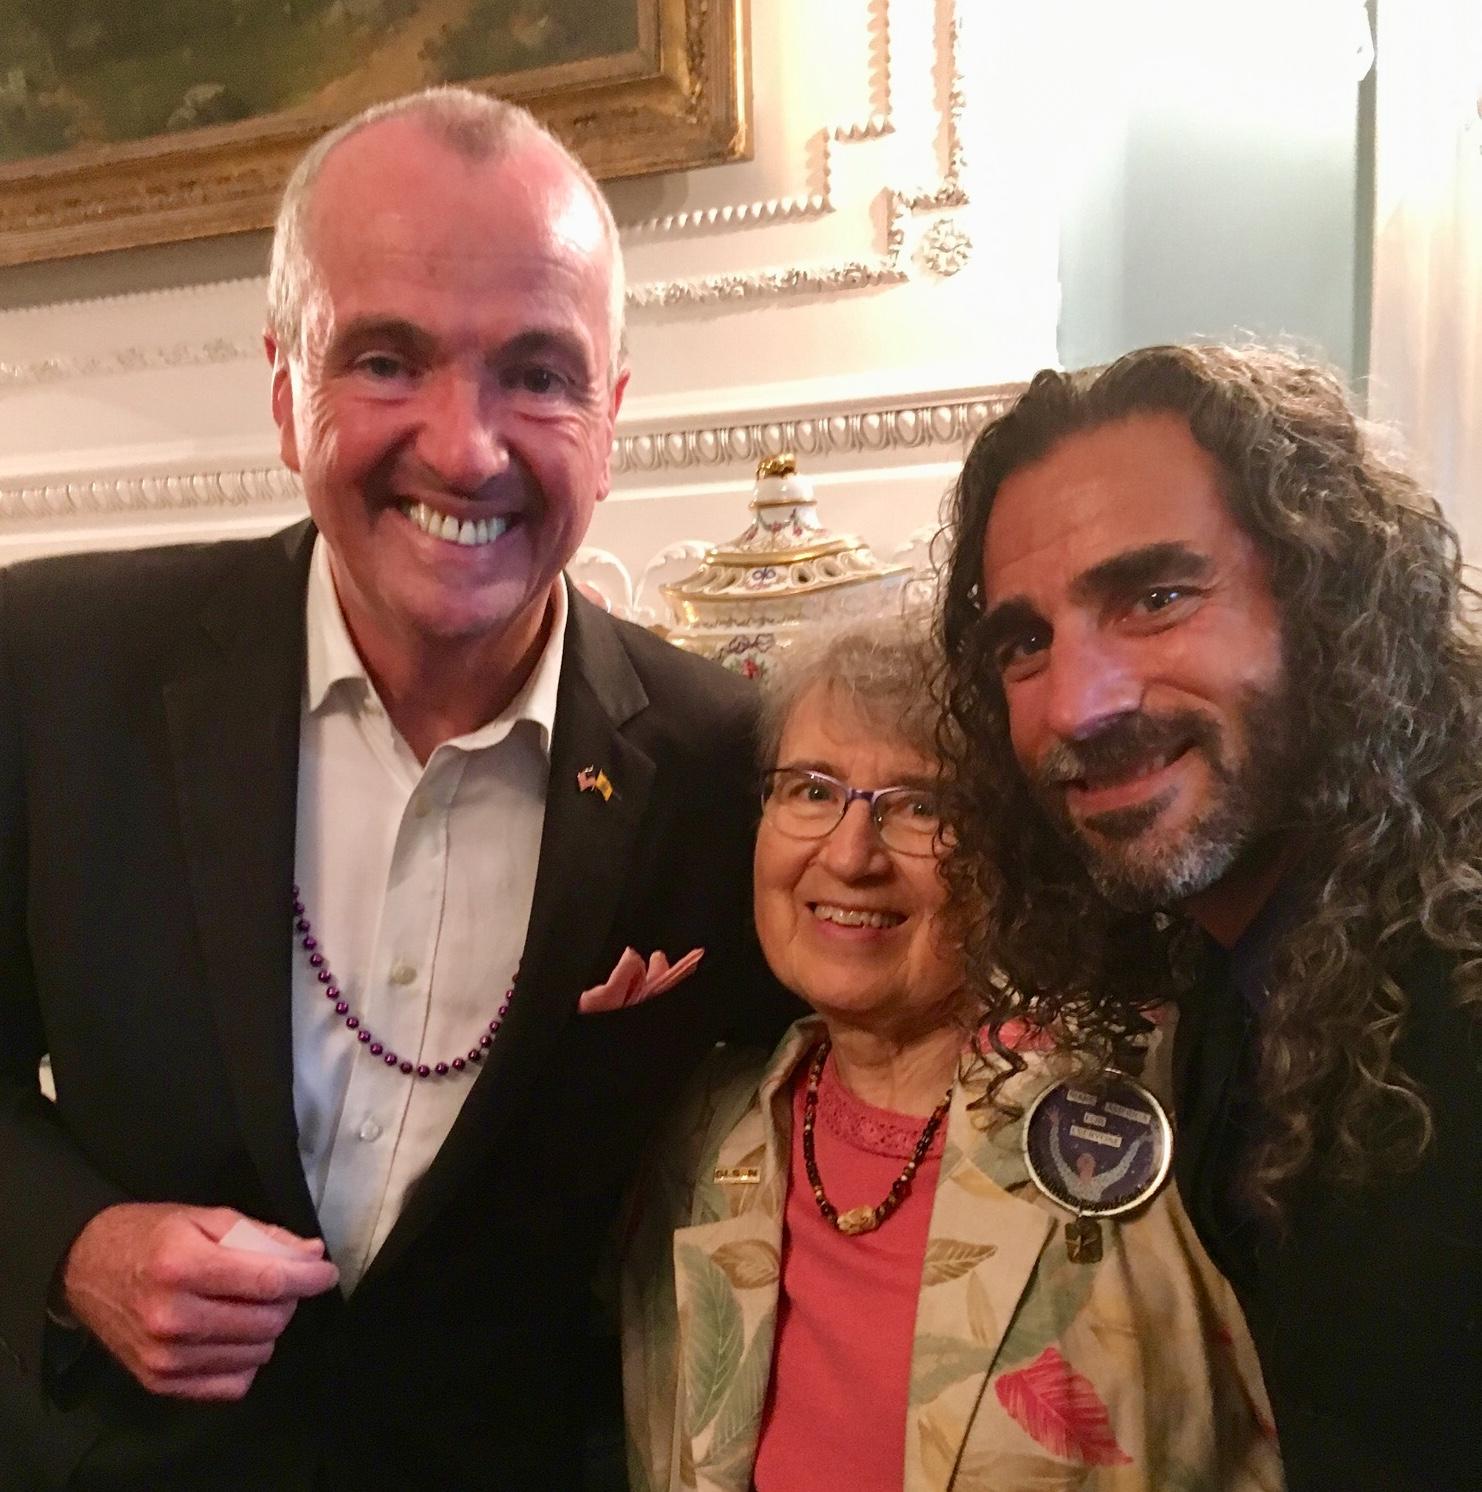 BRCSJ Chief Activist Robt Seda-Schreiber with Governor Murphy & Board Member Carol Watchler (proud @ Pride Reception, Governor's Mansion).jpg